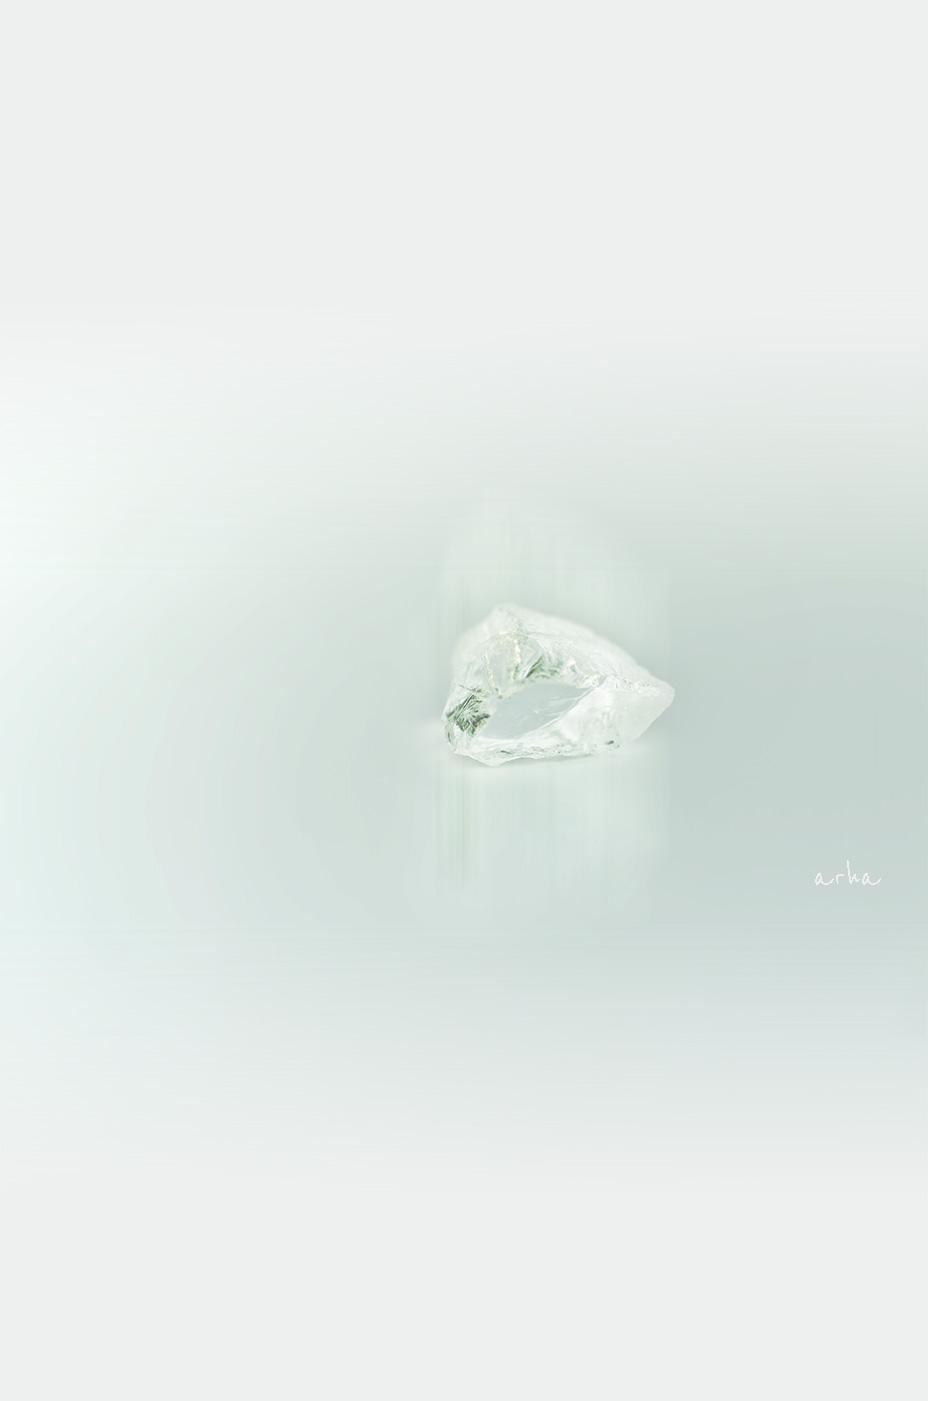 stay-with-minimalism-copyright-2012-arha-Tomomichi-Morifuji